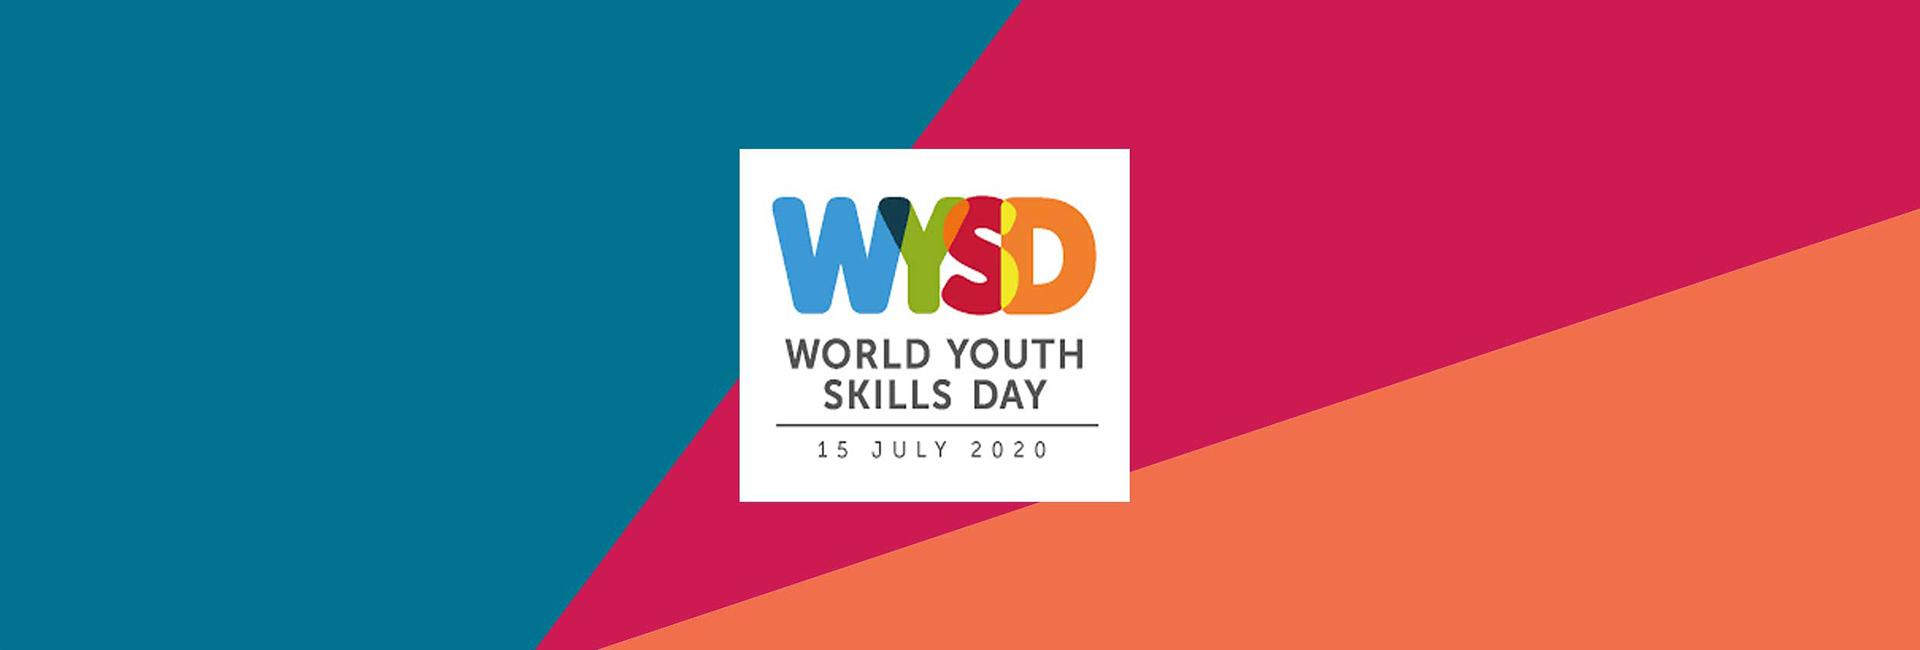 World Youth Skills Day - 15 July 2020